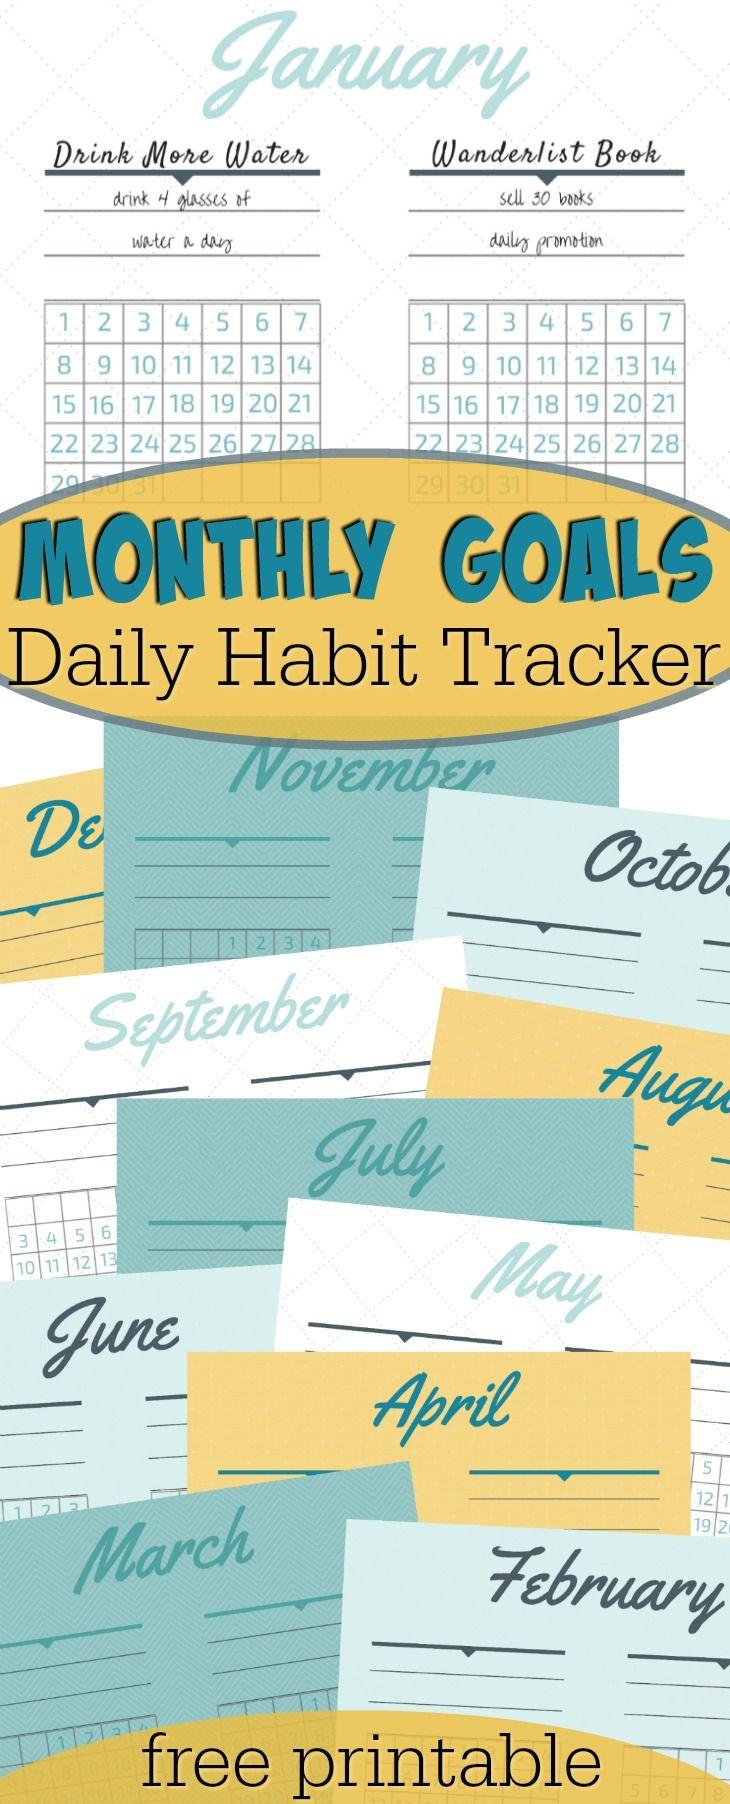 new years goals template - 1000 ideas about goals worksheet on pinterest goal